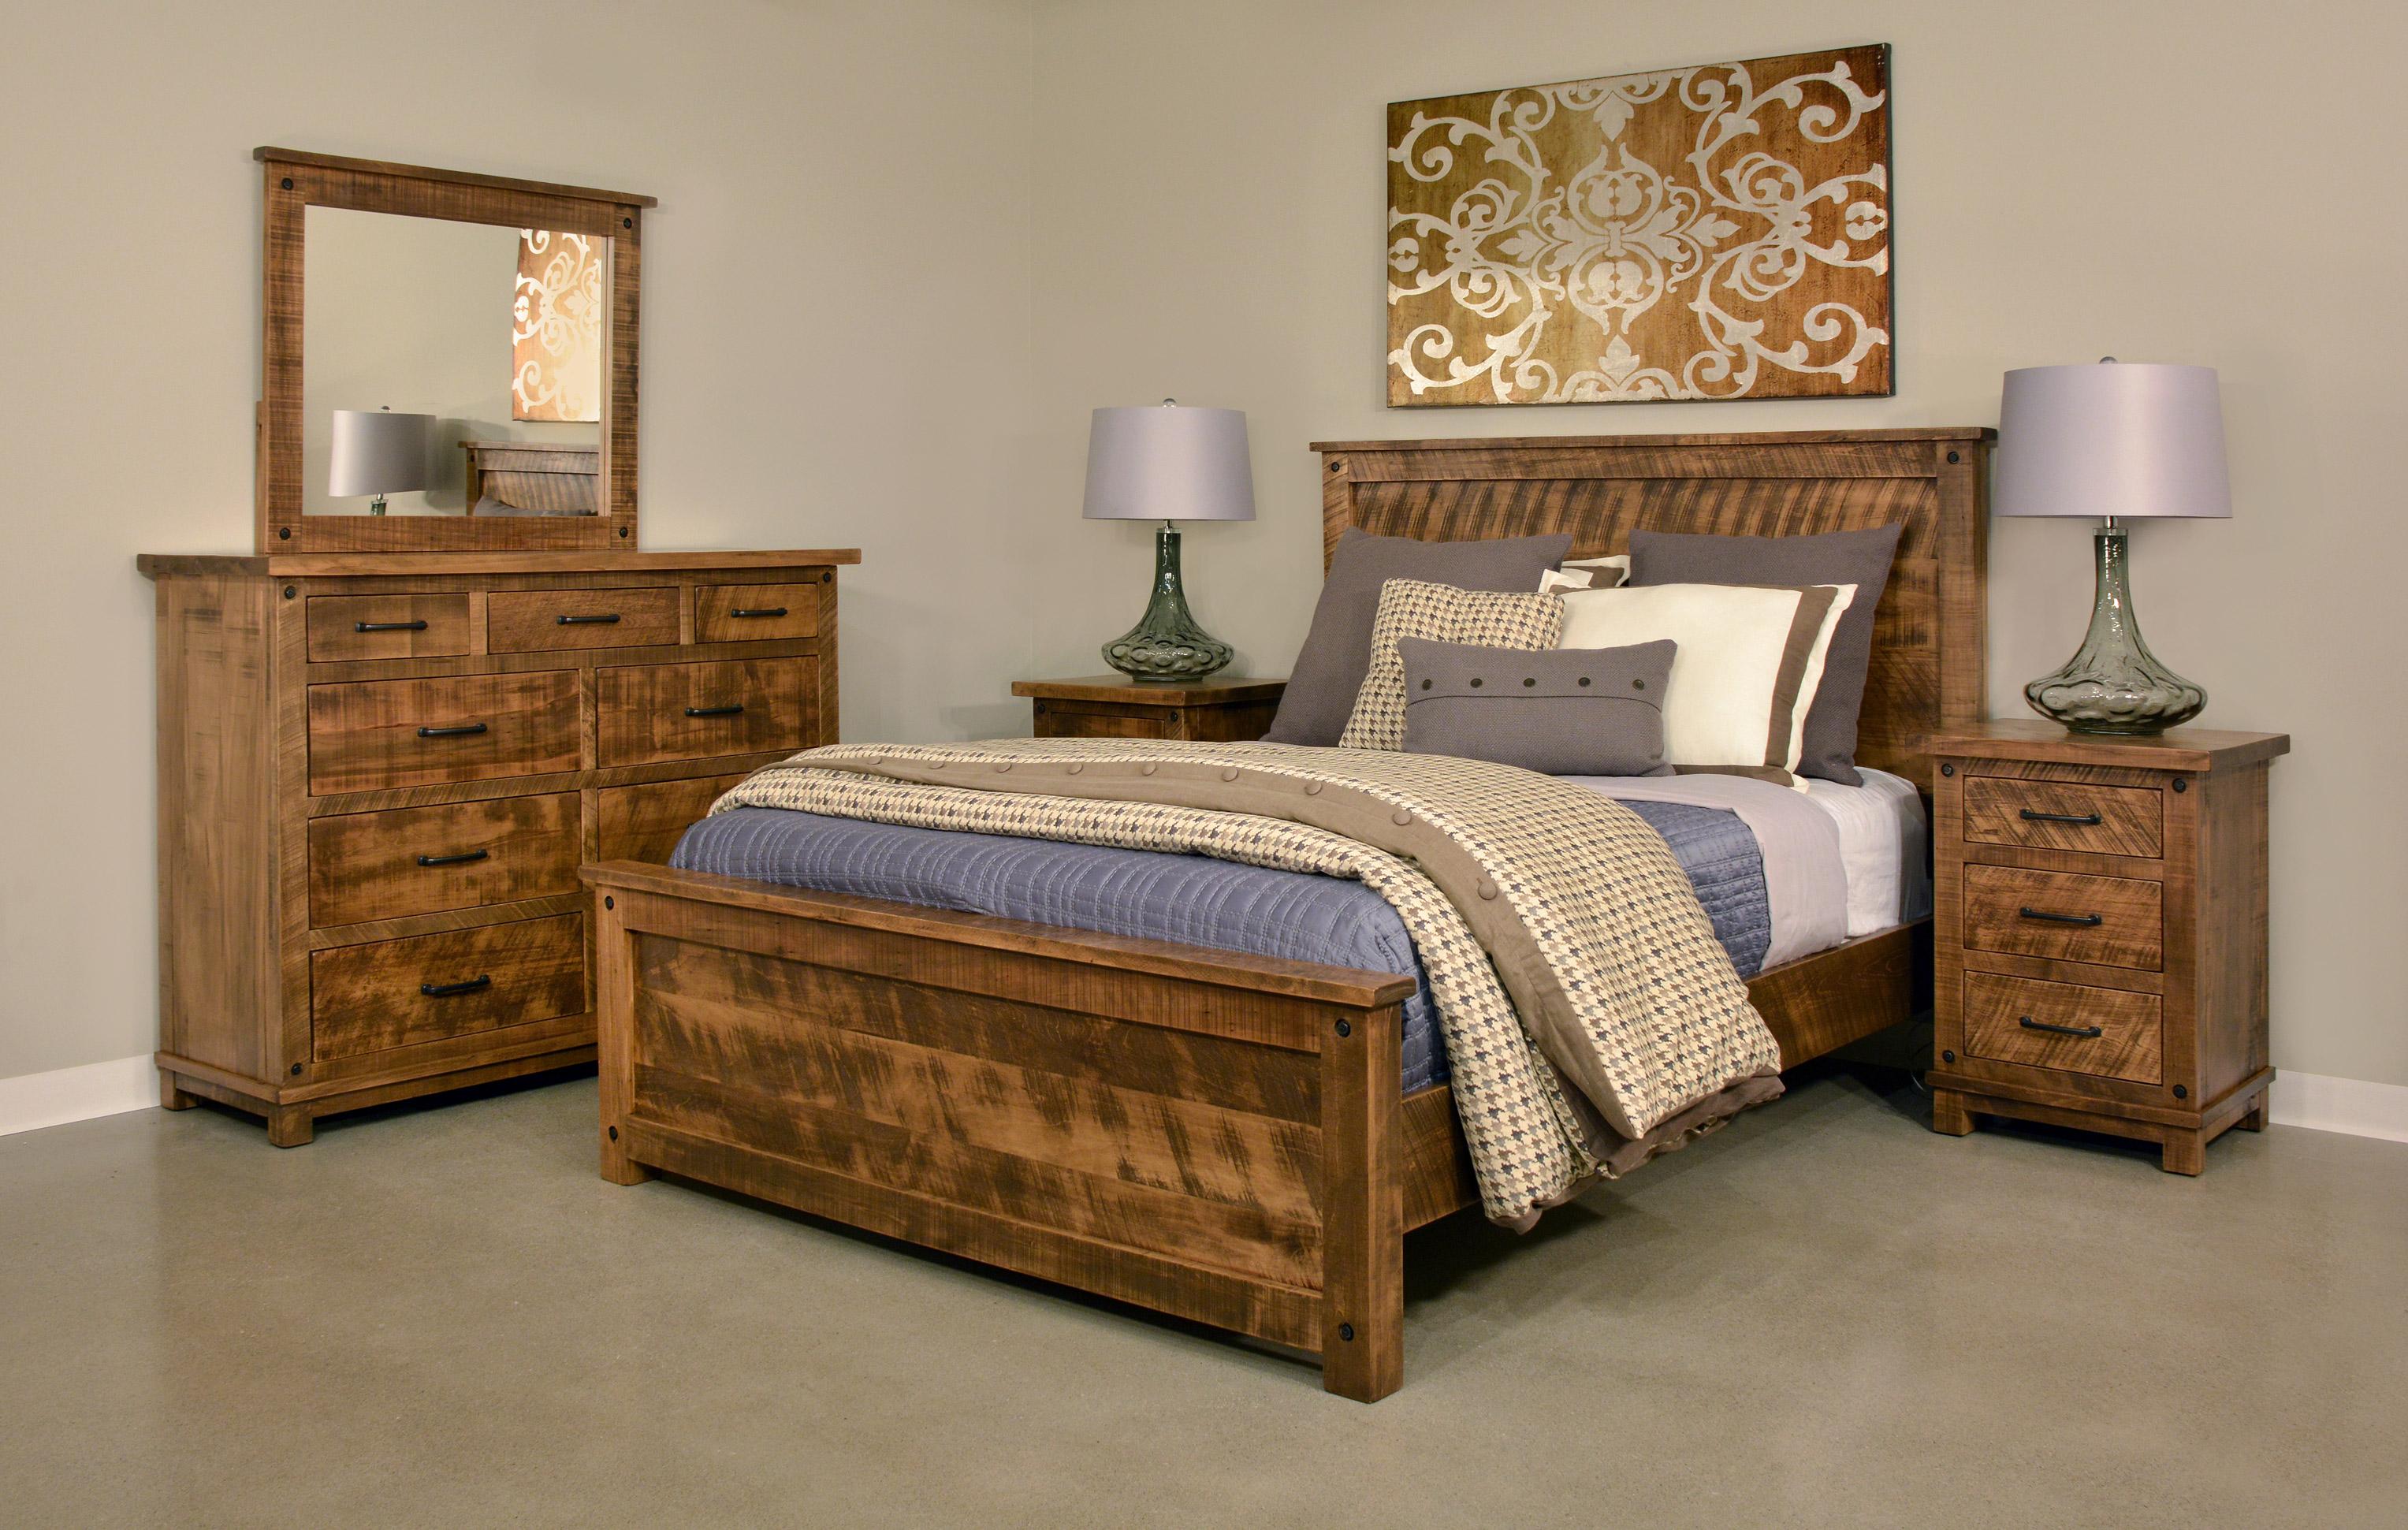 Adirondack bedroom furniture we have for sale